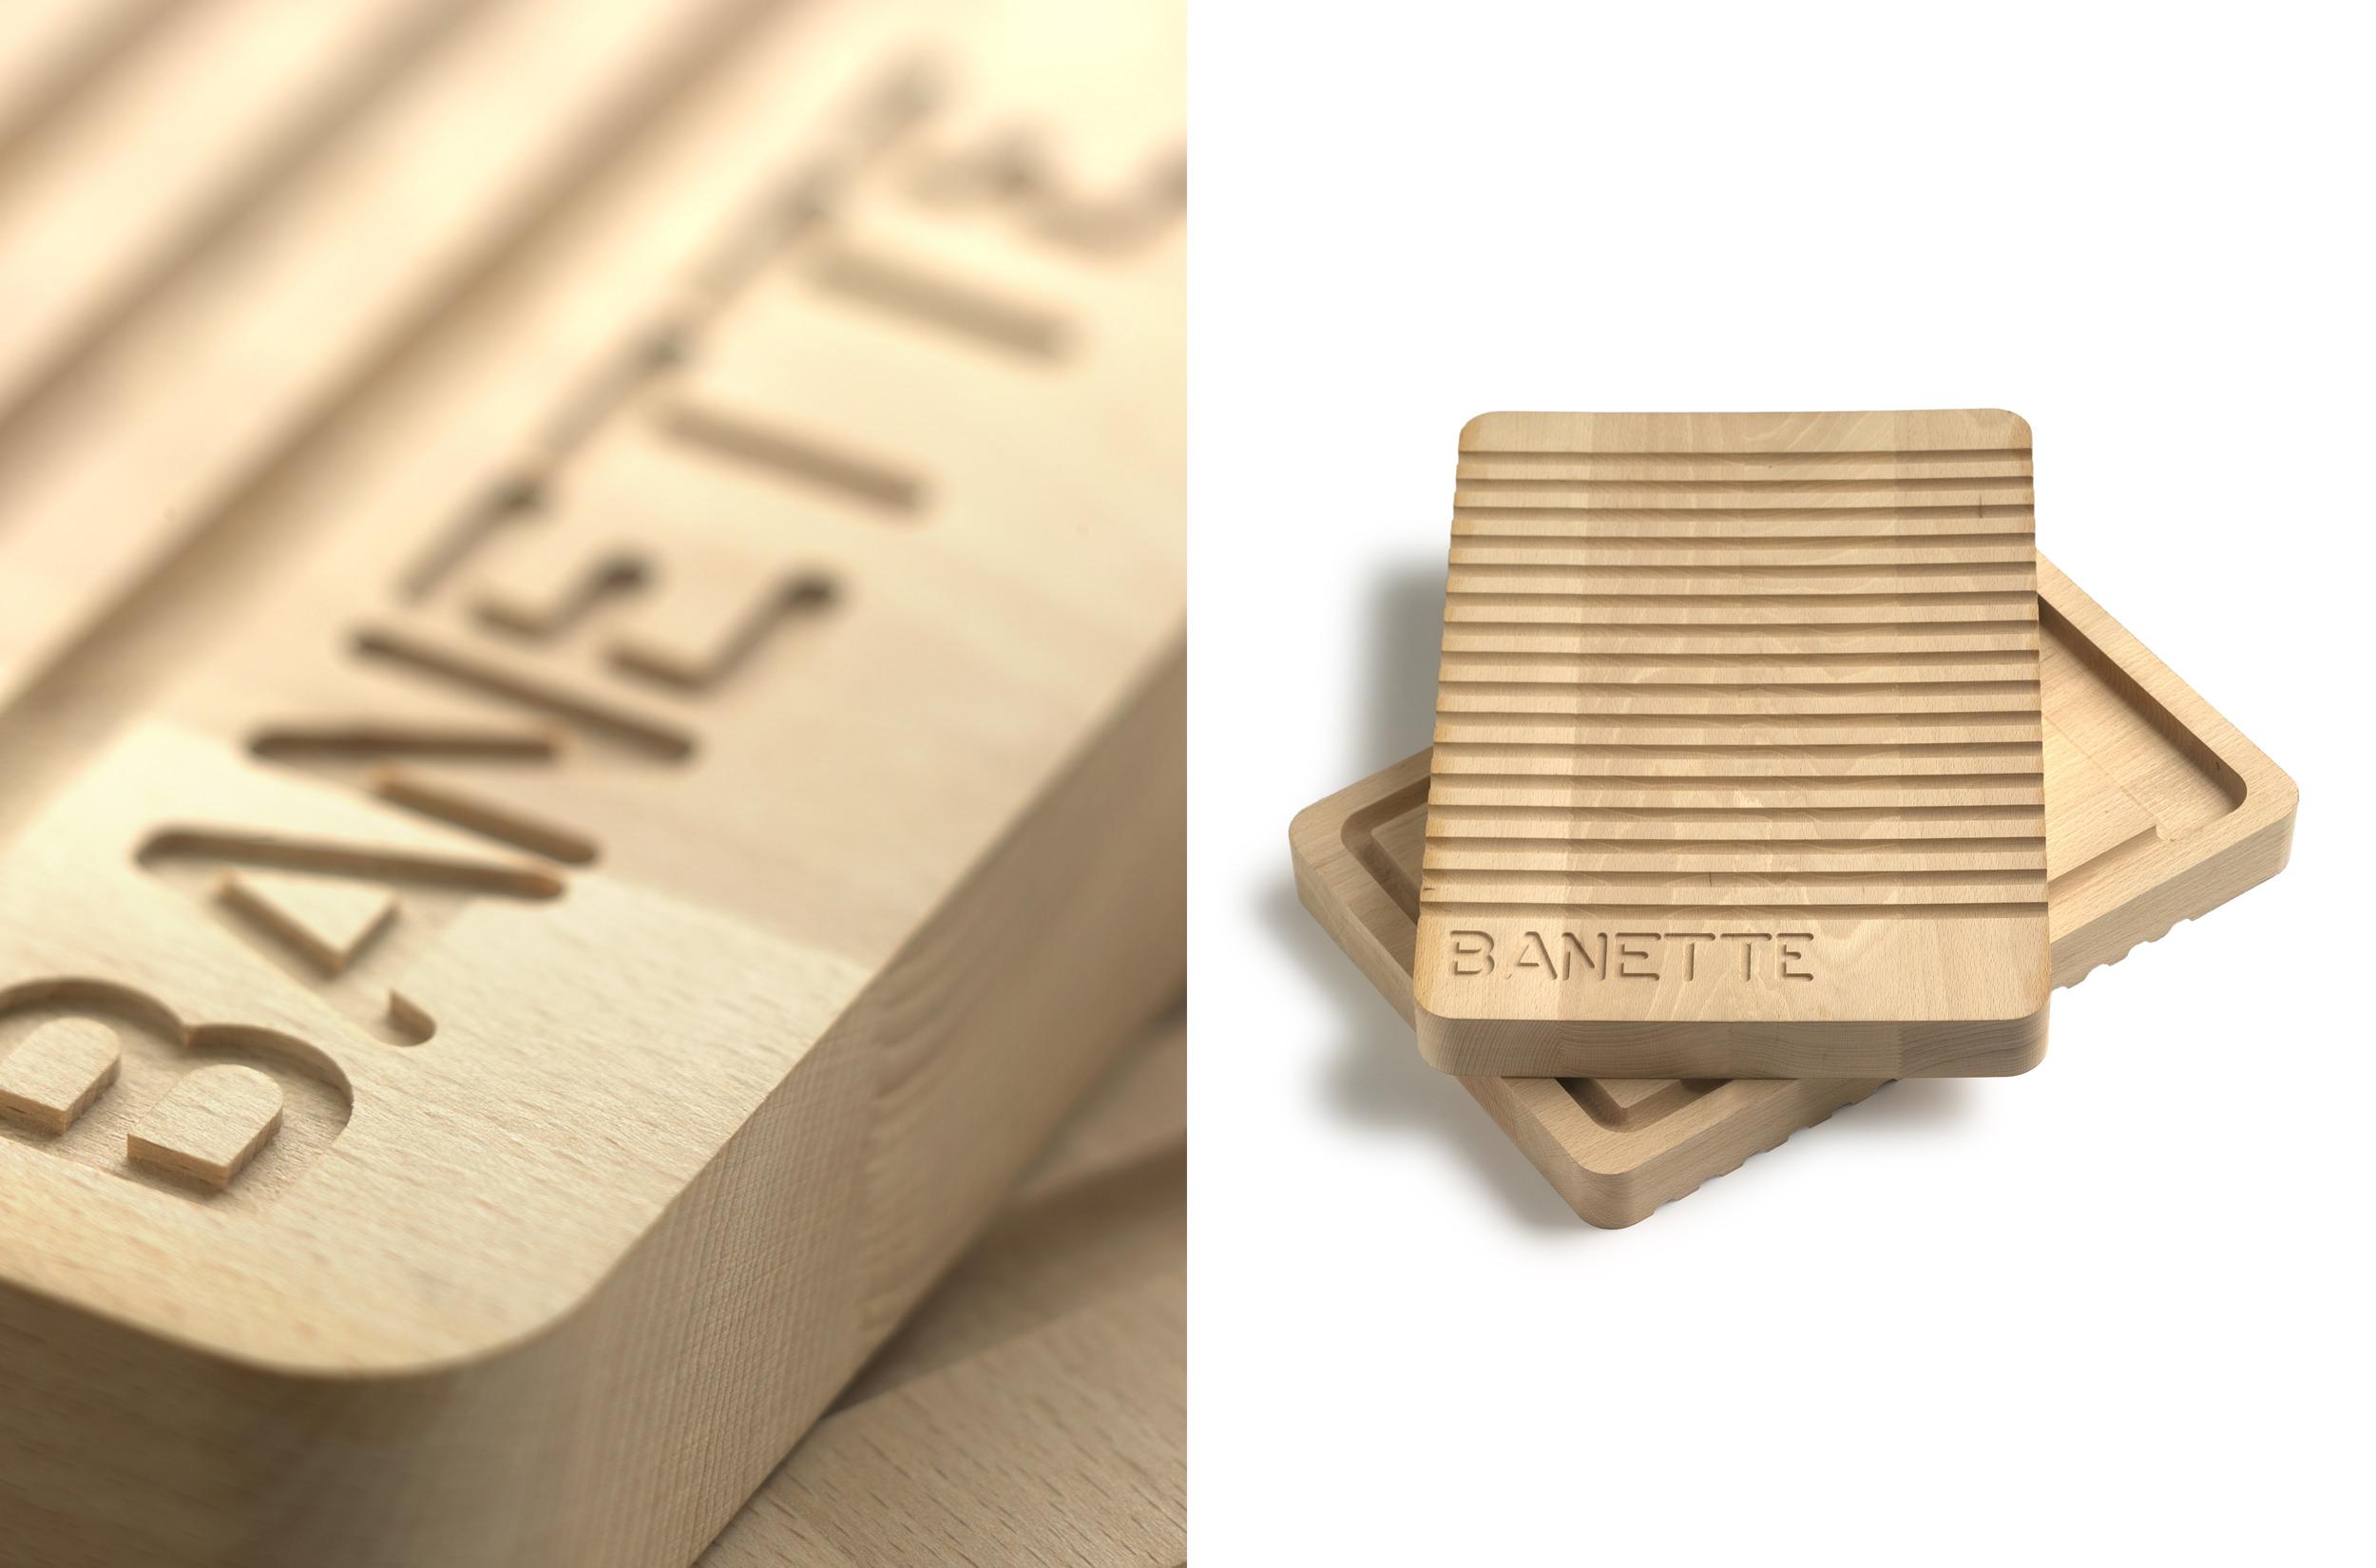 Les objets Banette - 1